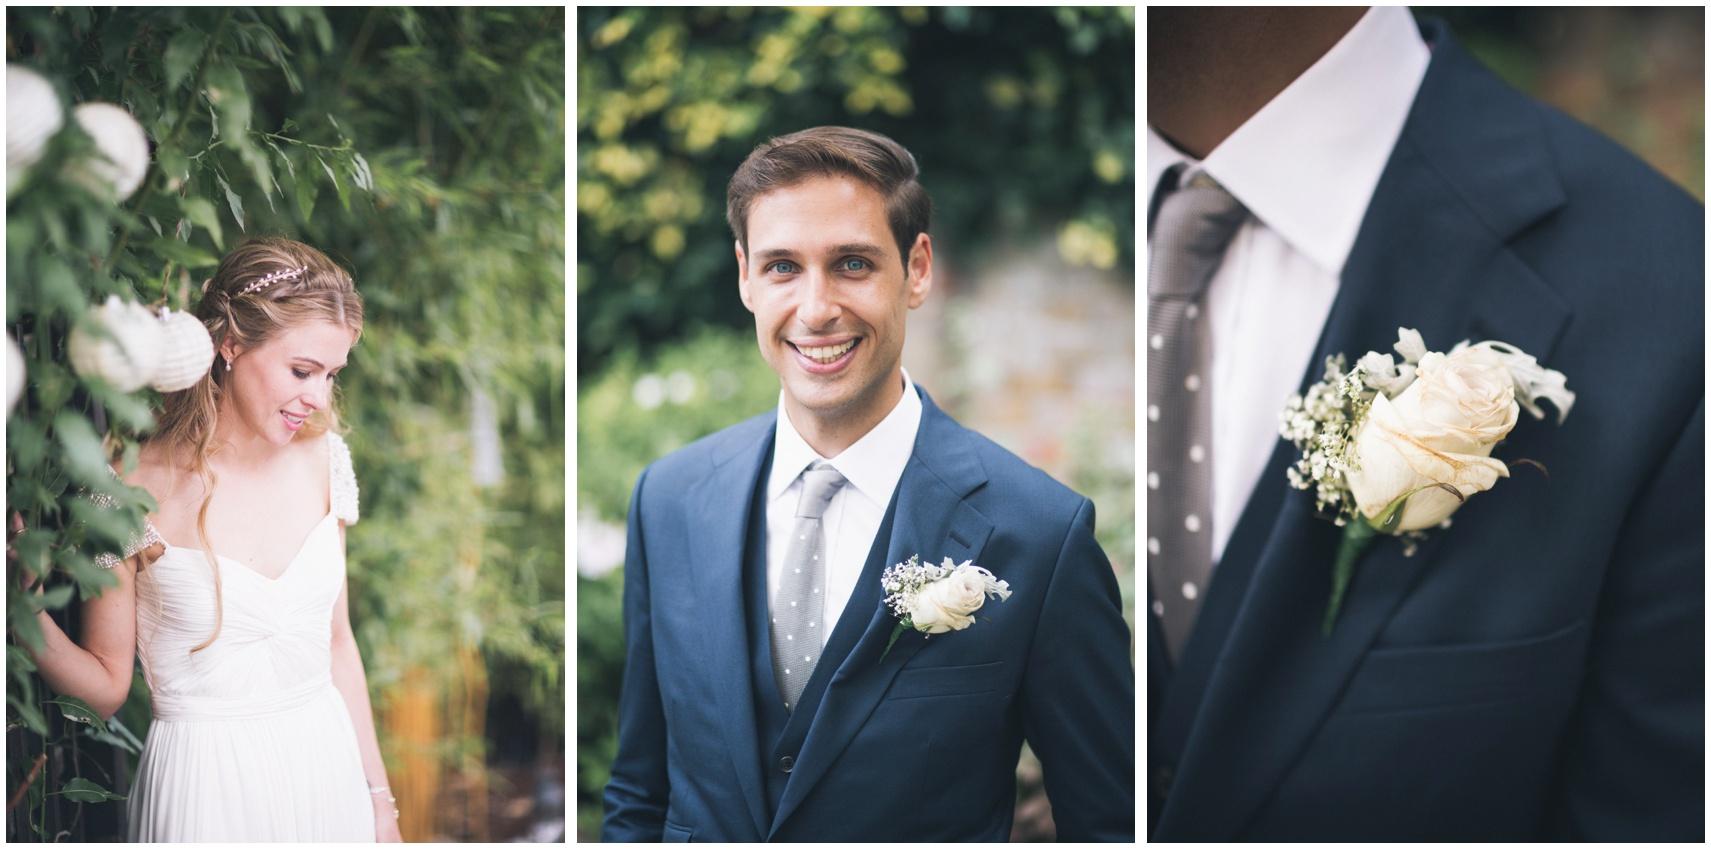 BMC Wedding photography Rutland_0330.jpg